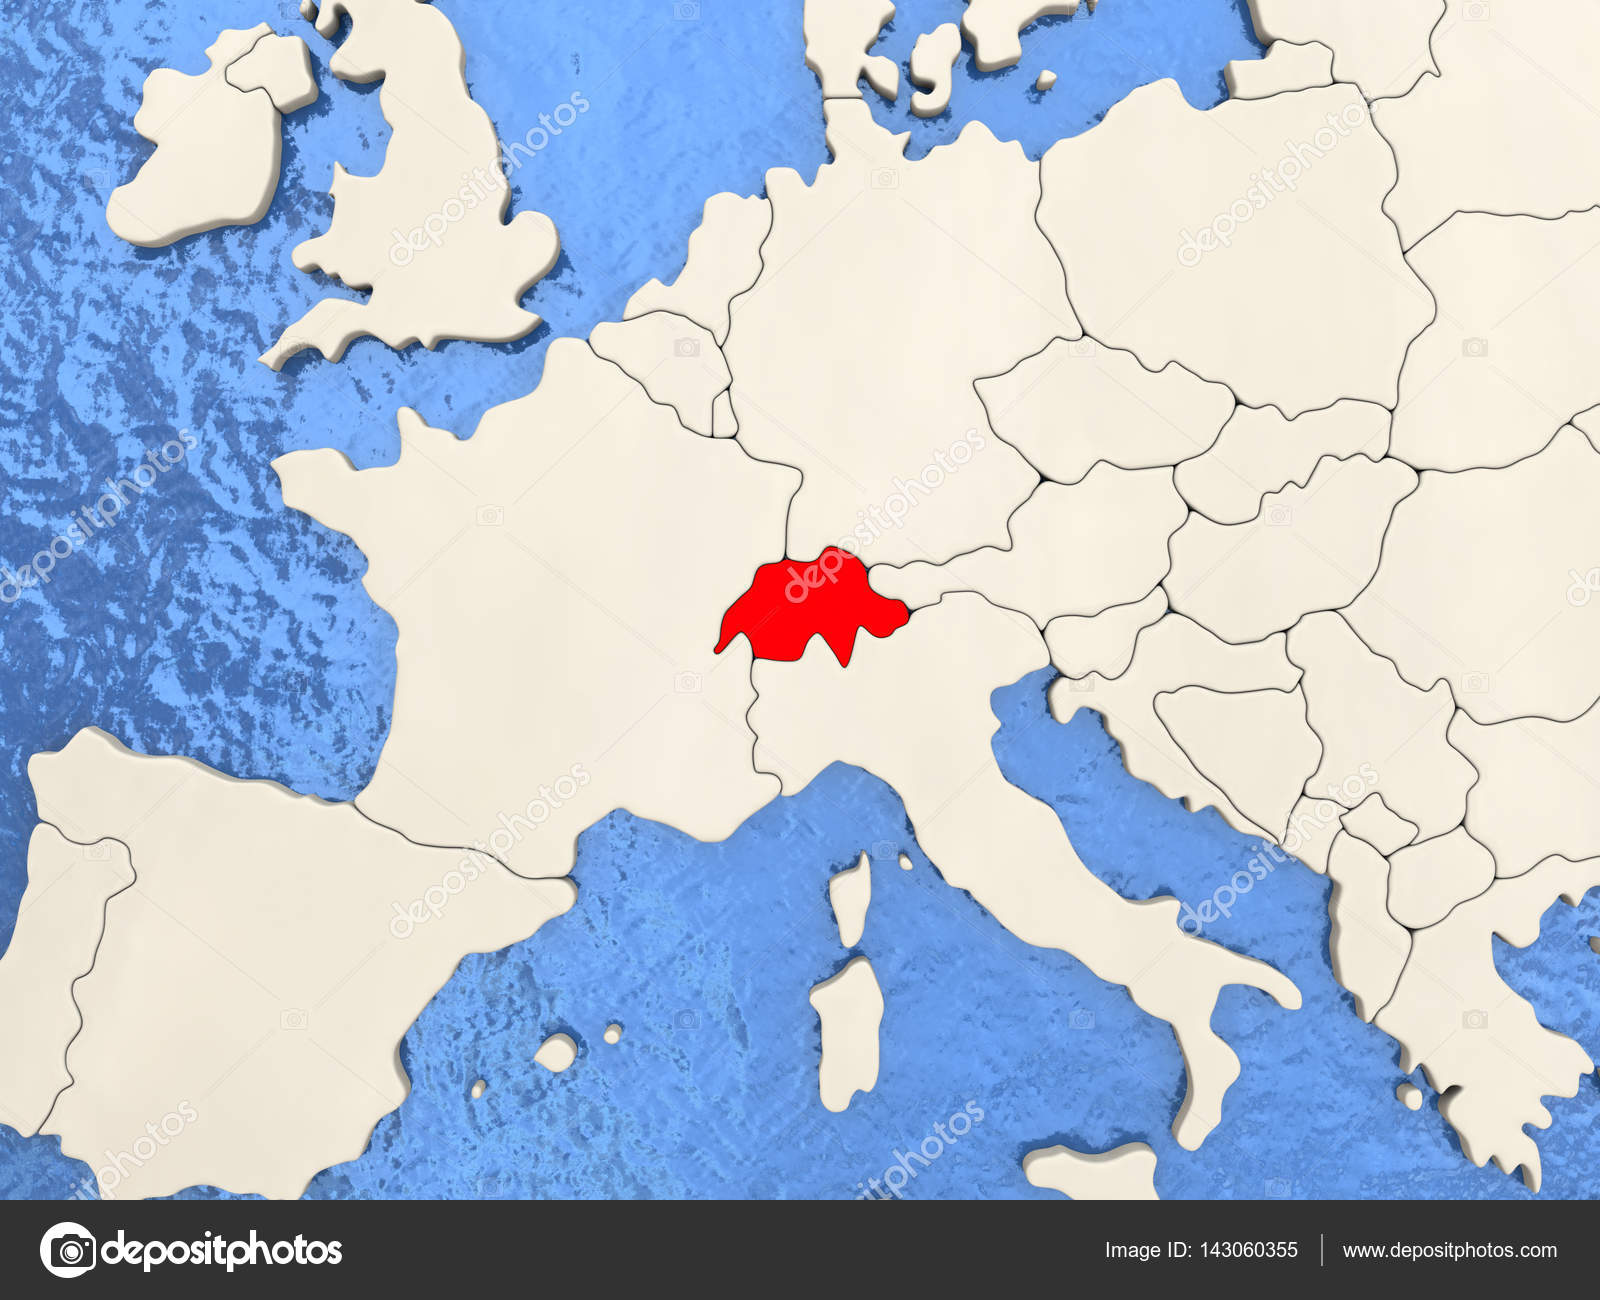 schweiz karta Schweiz på karta — Stockfotografi © tom.griger #143060355 schweiz karta